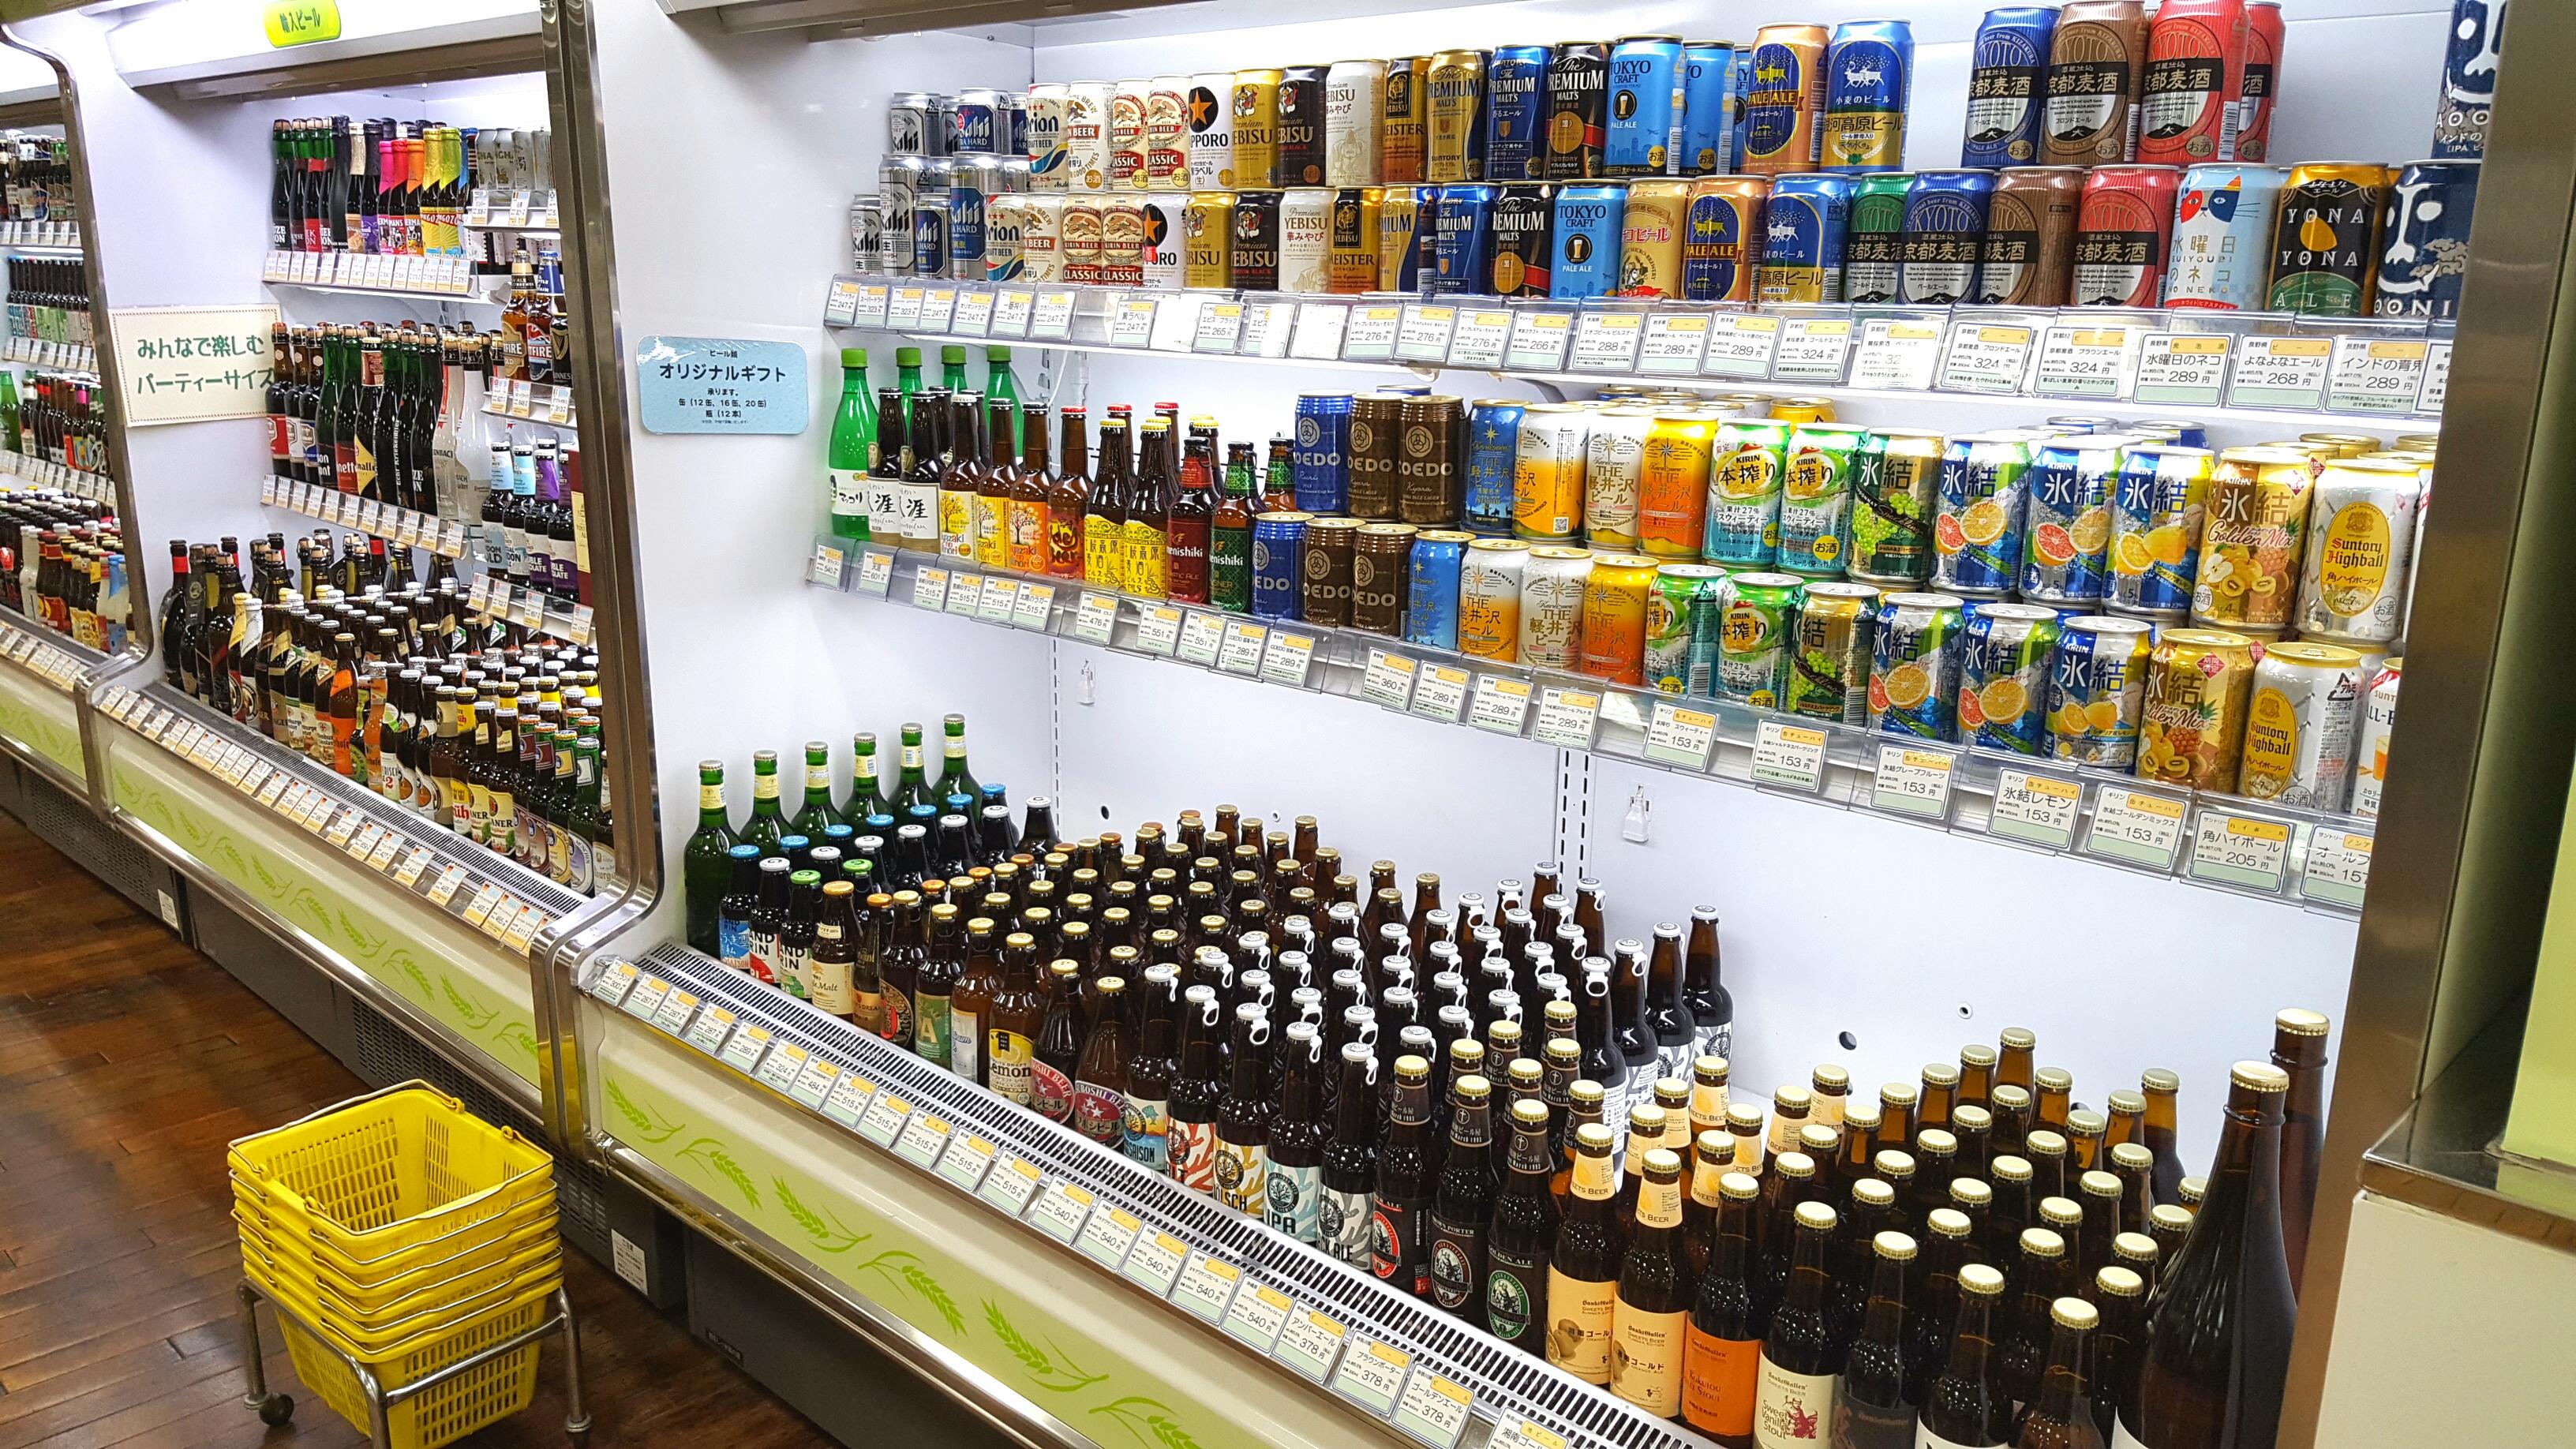 Japan's craft beer scene has developed well